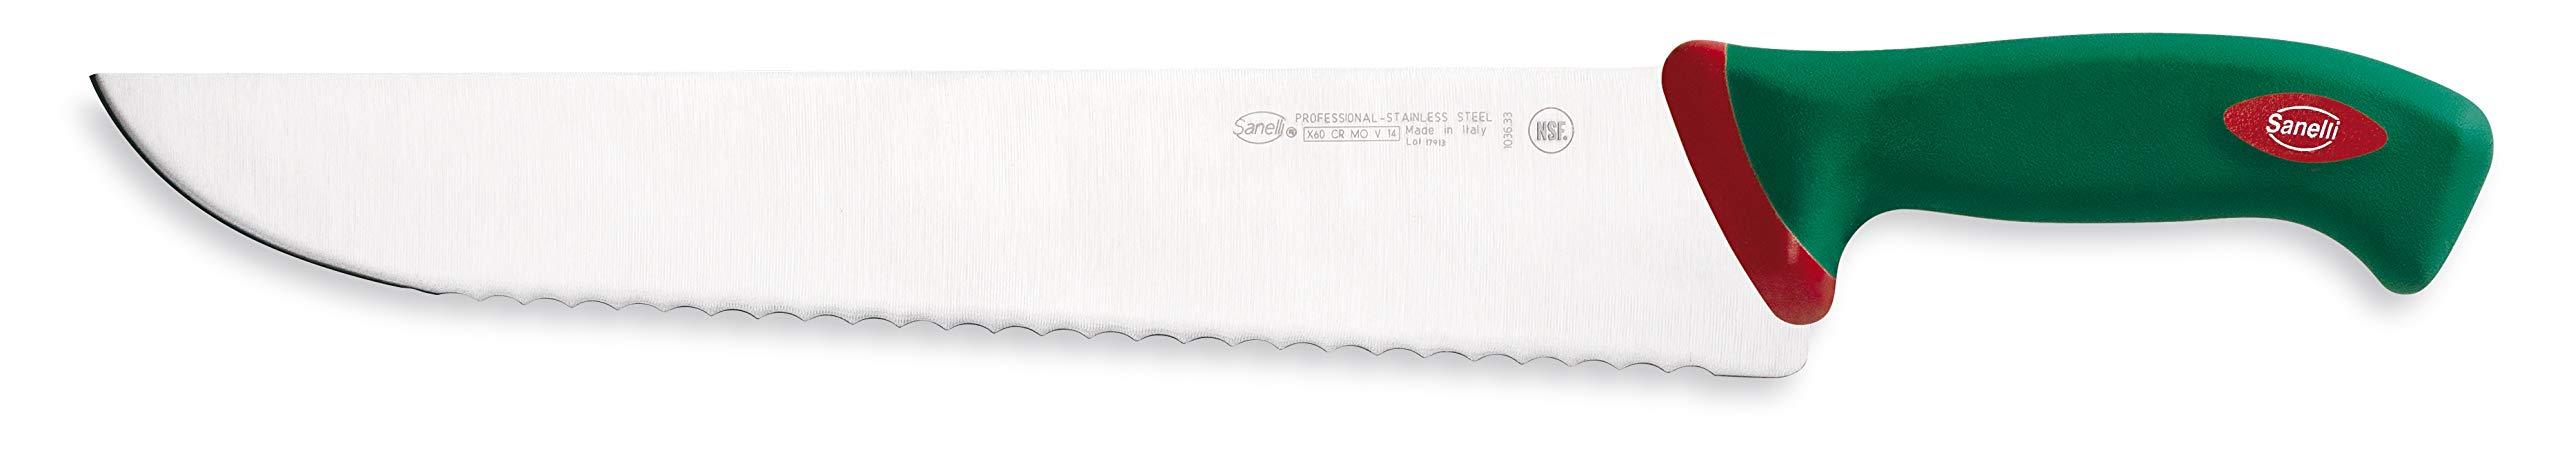 Sanelli SN-103633 Premana Professional Fish Knife, 13'', Silver/Green by Sanelli (Image #1)